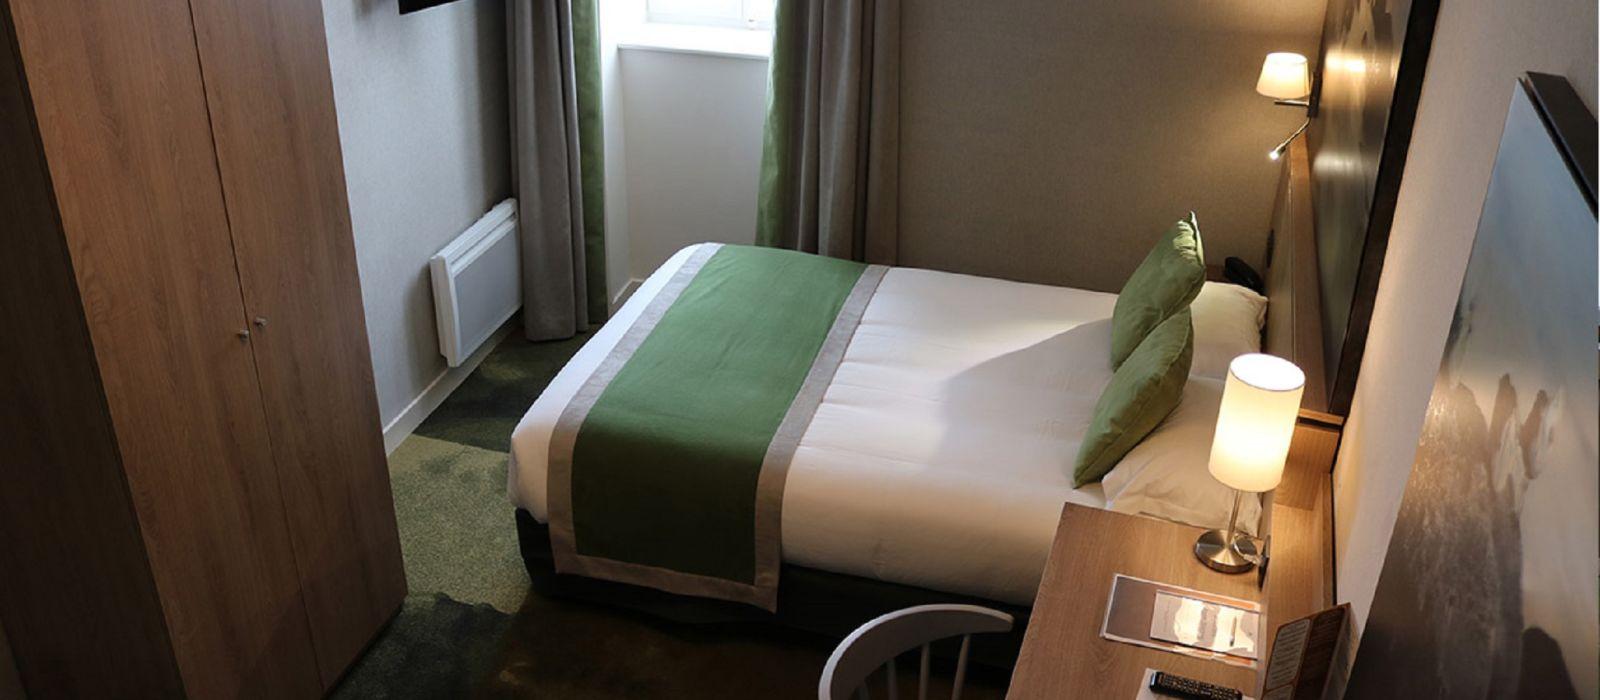 Hotel Le Mouton Blanc France